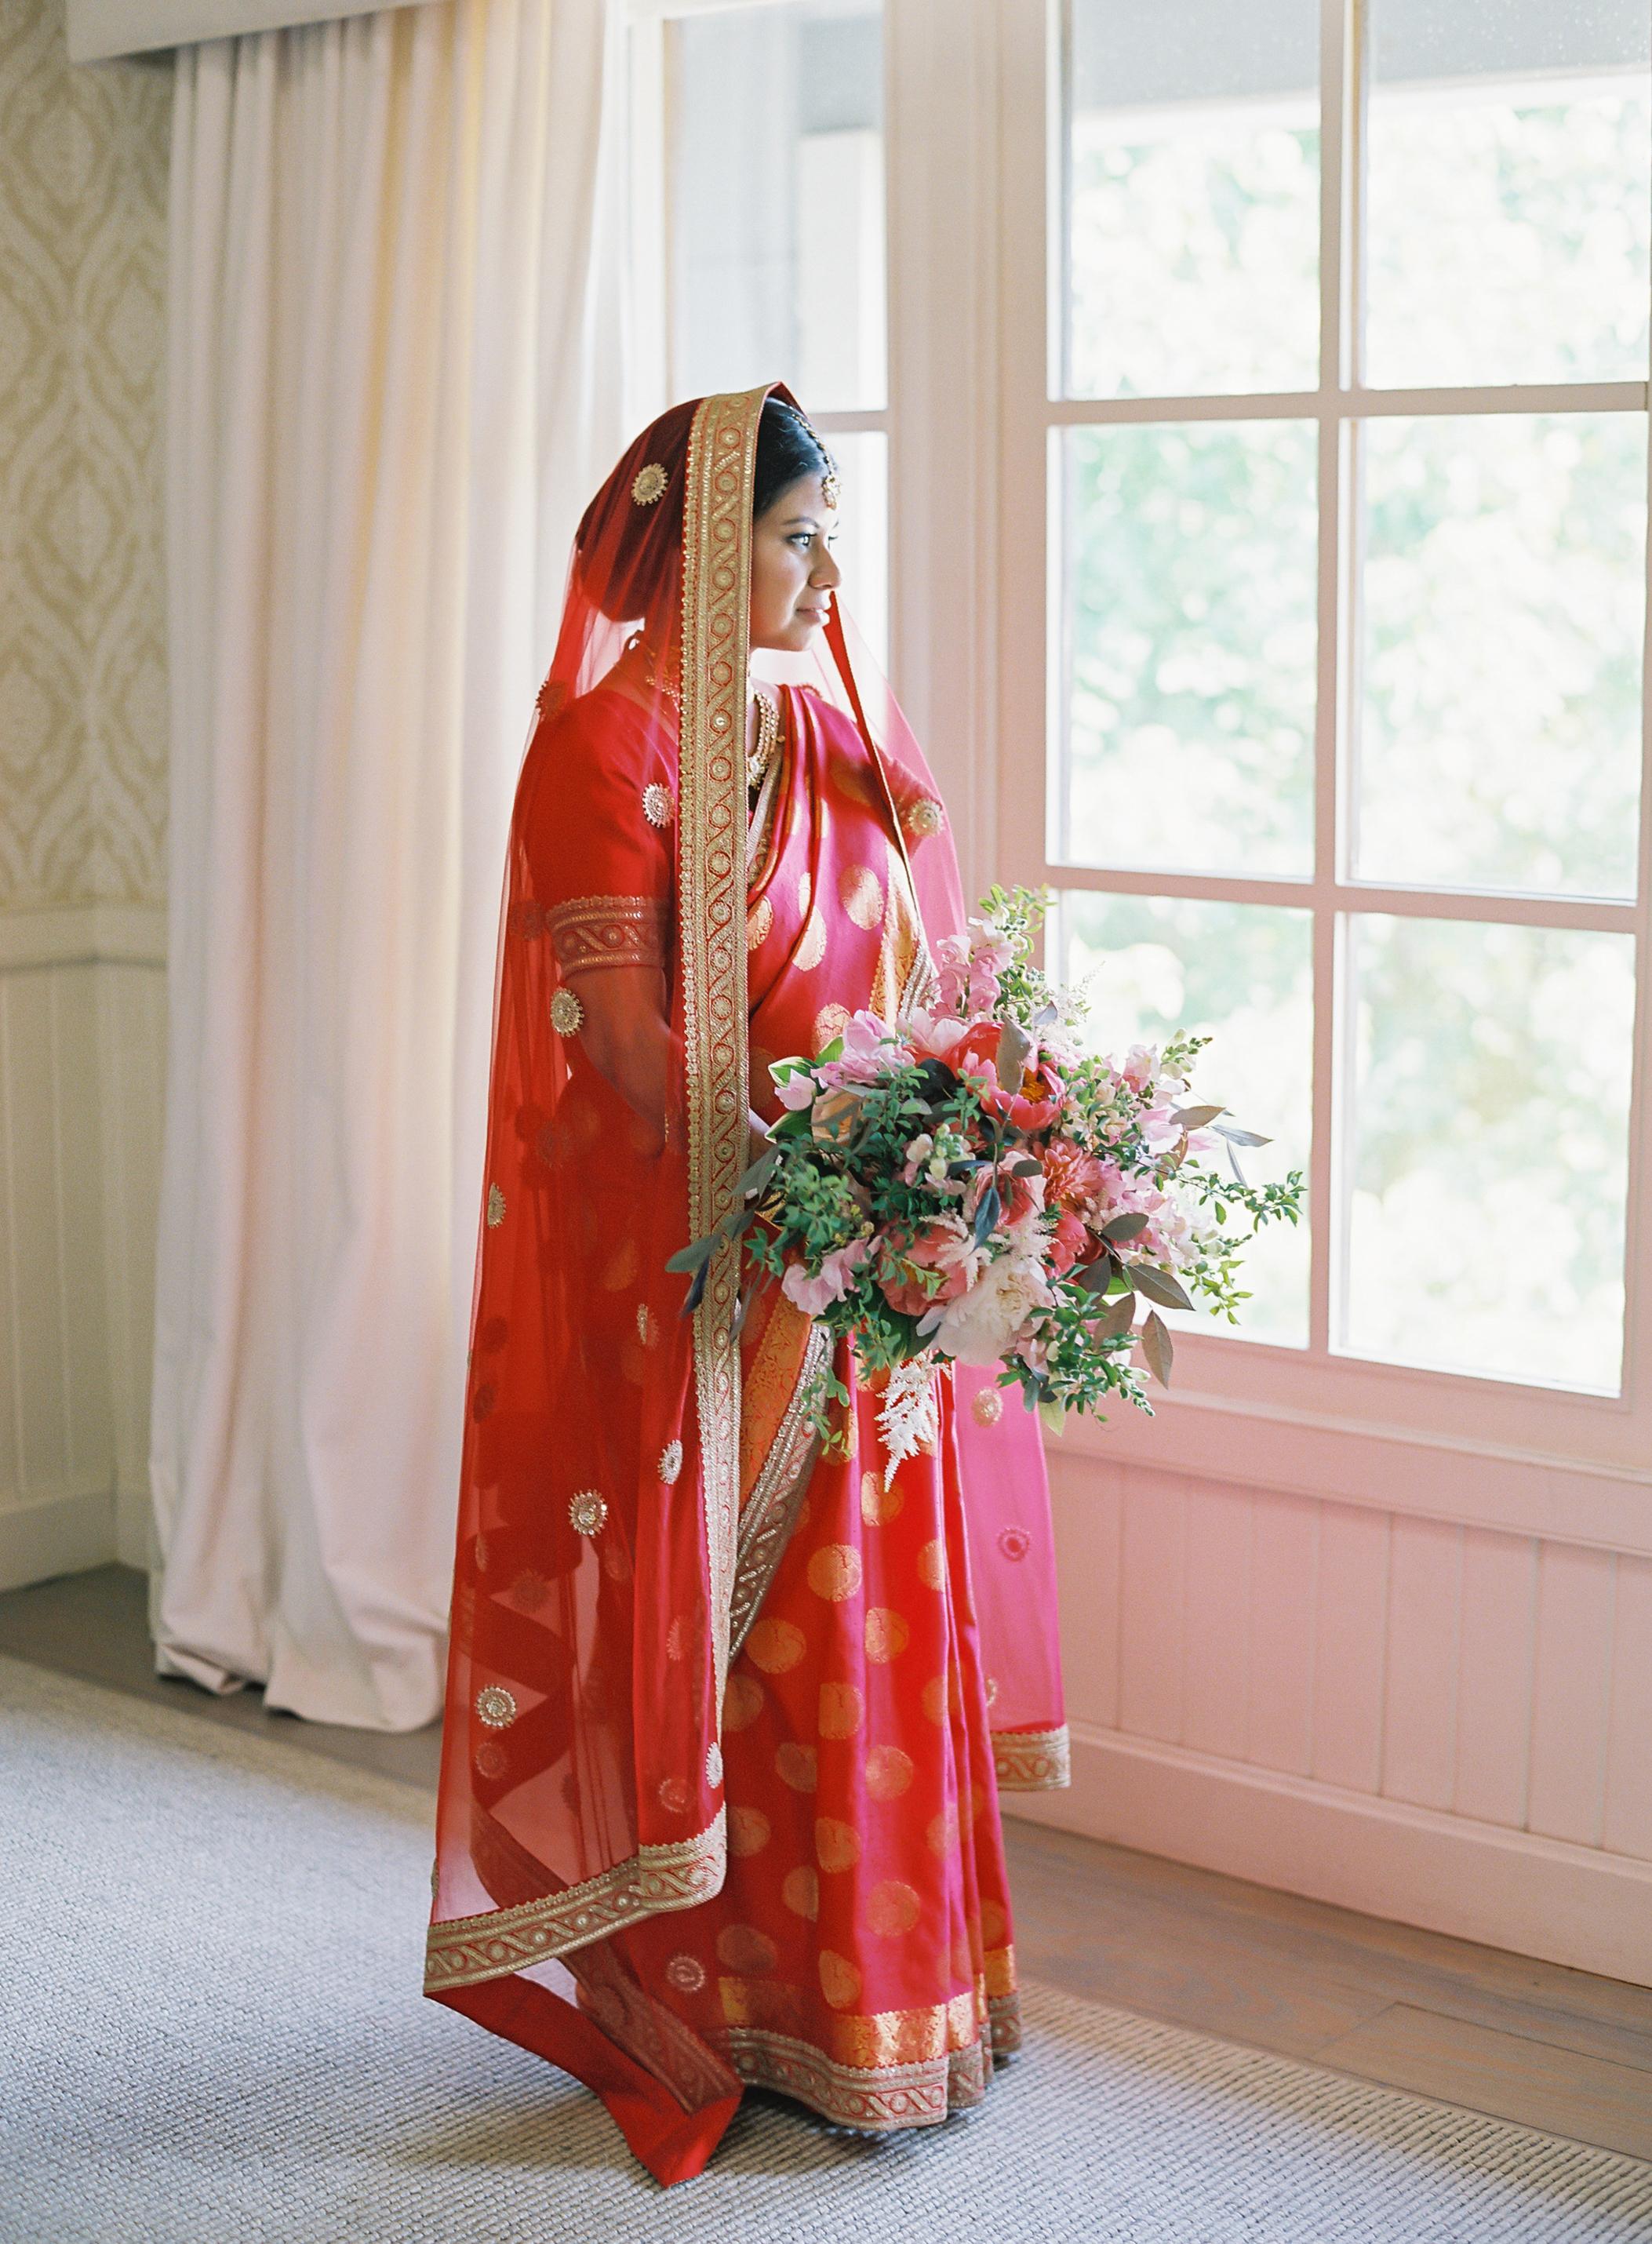 ronita ryan wedding bride gazing out of window in veil